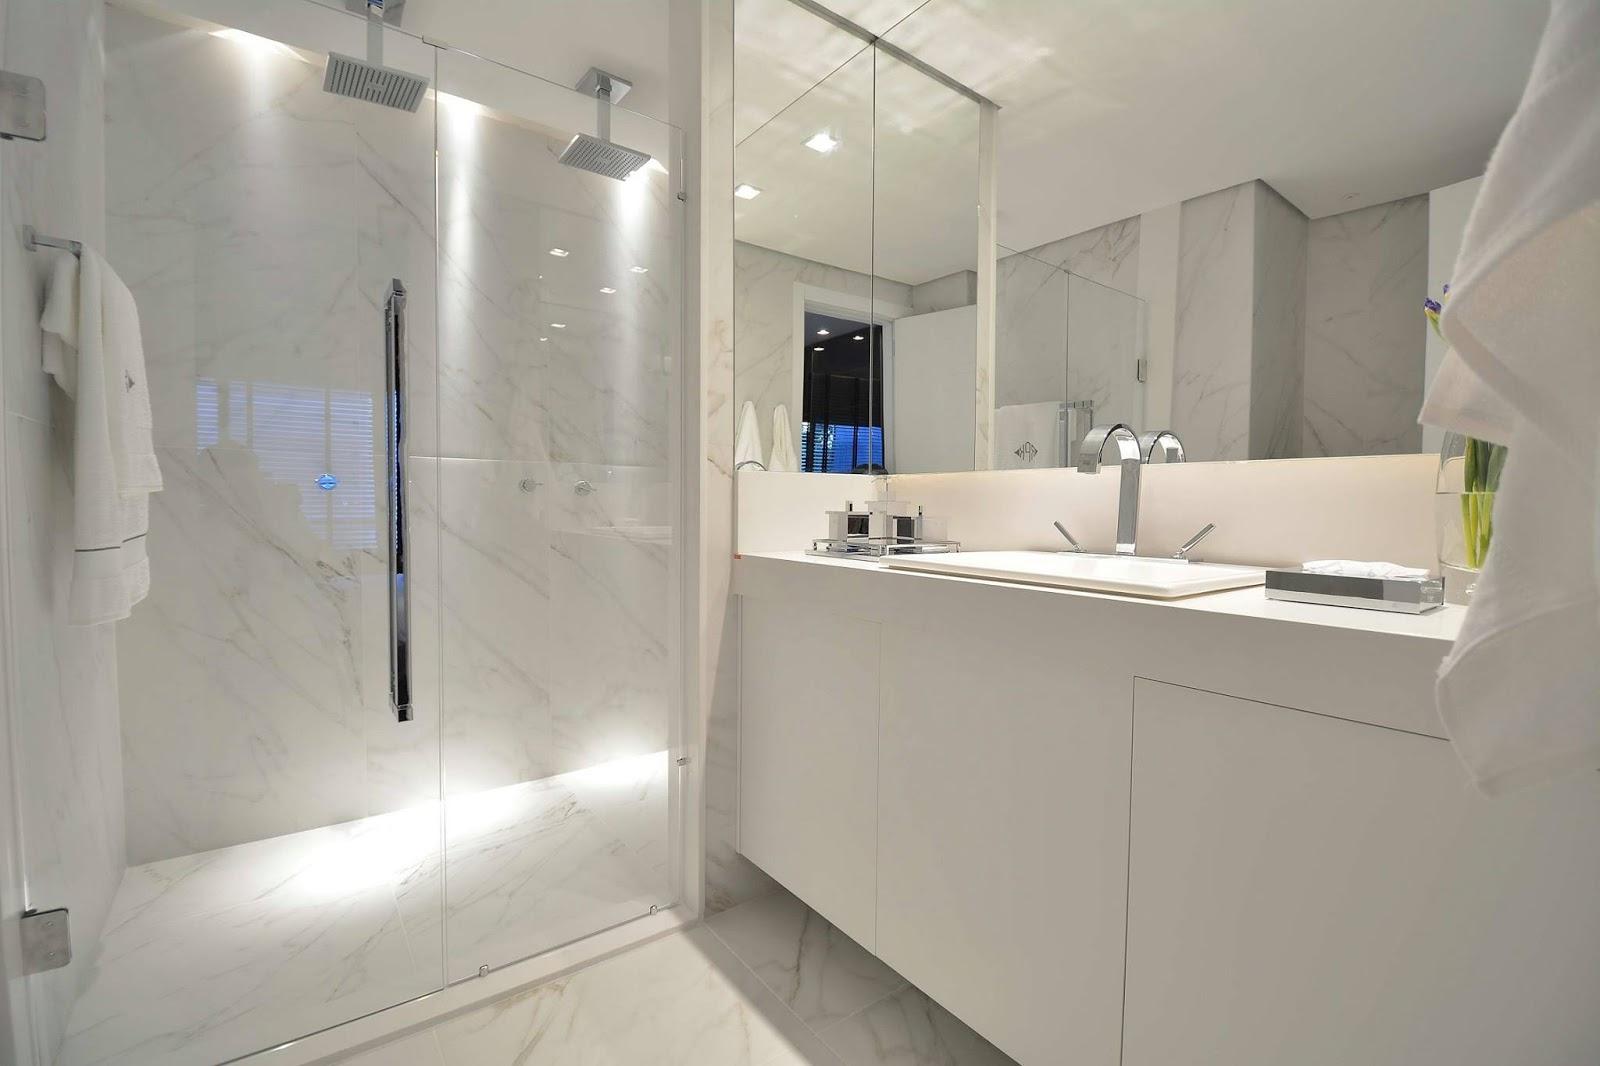 Construindo Minha Casa Clean: 20 Bancadas Brancas de Banheiros/Lavabos  #2A54A1 1600x1066 Bancadas Banheiros Modernos